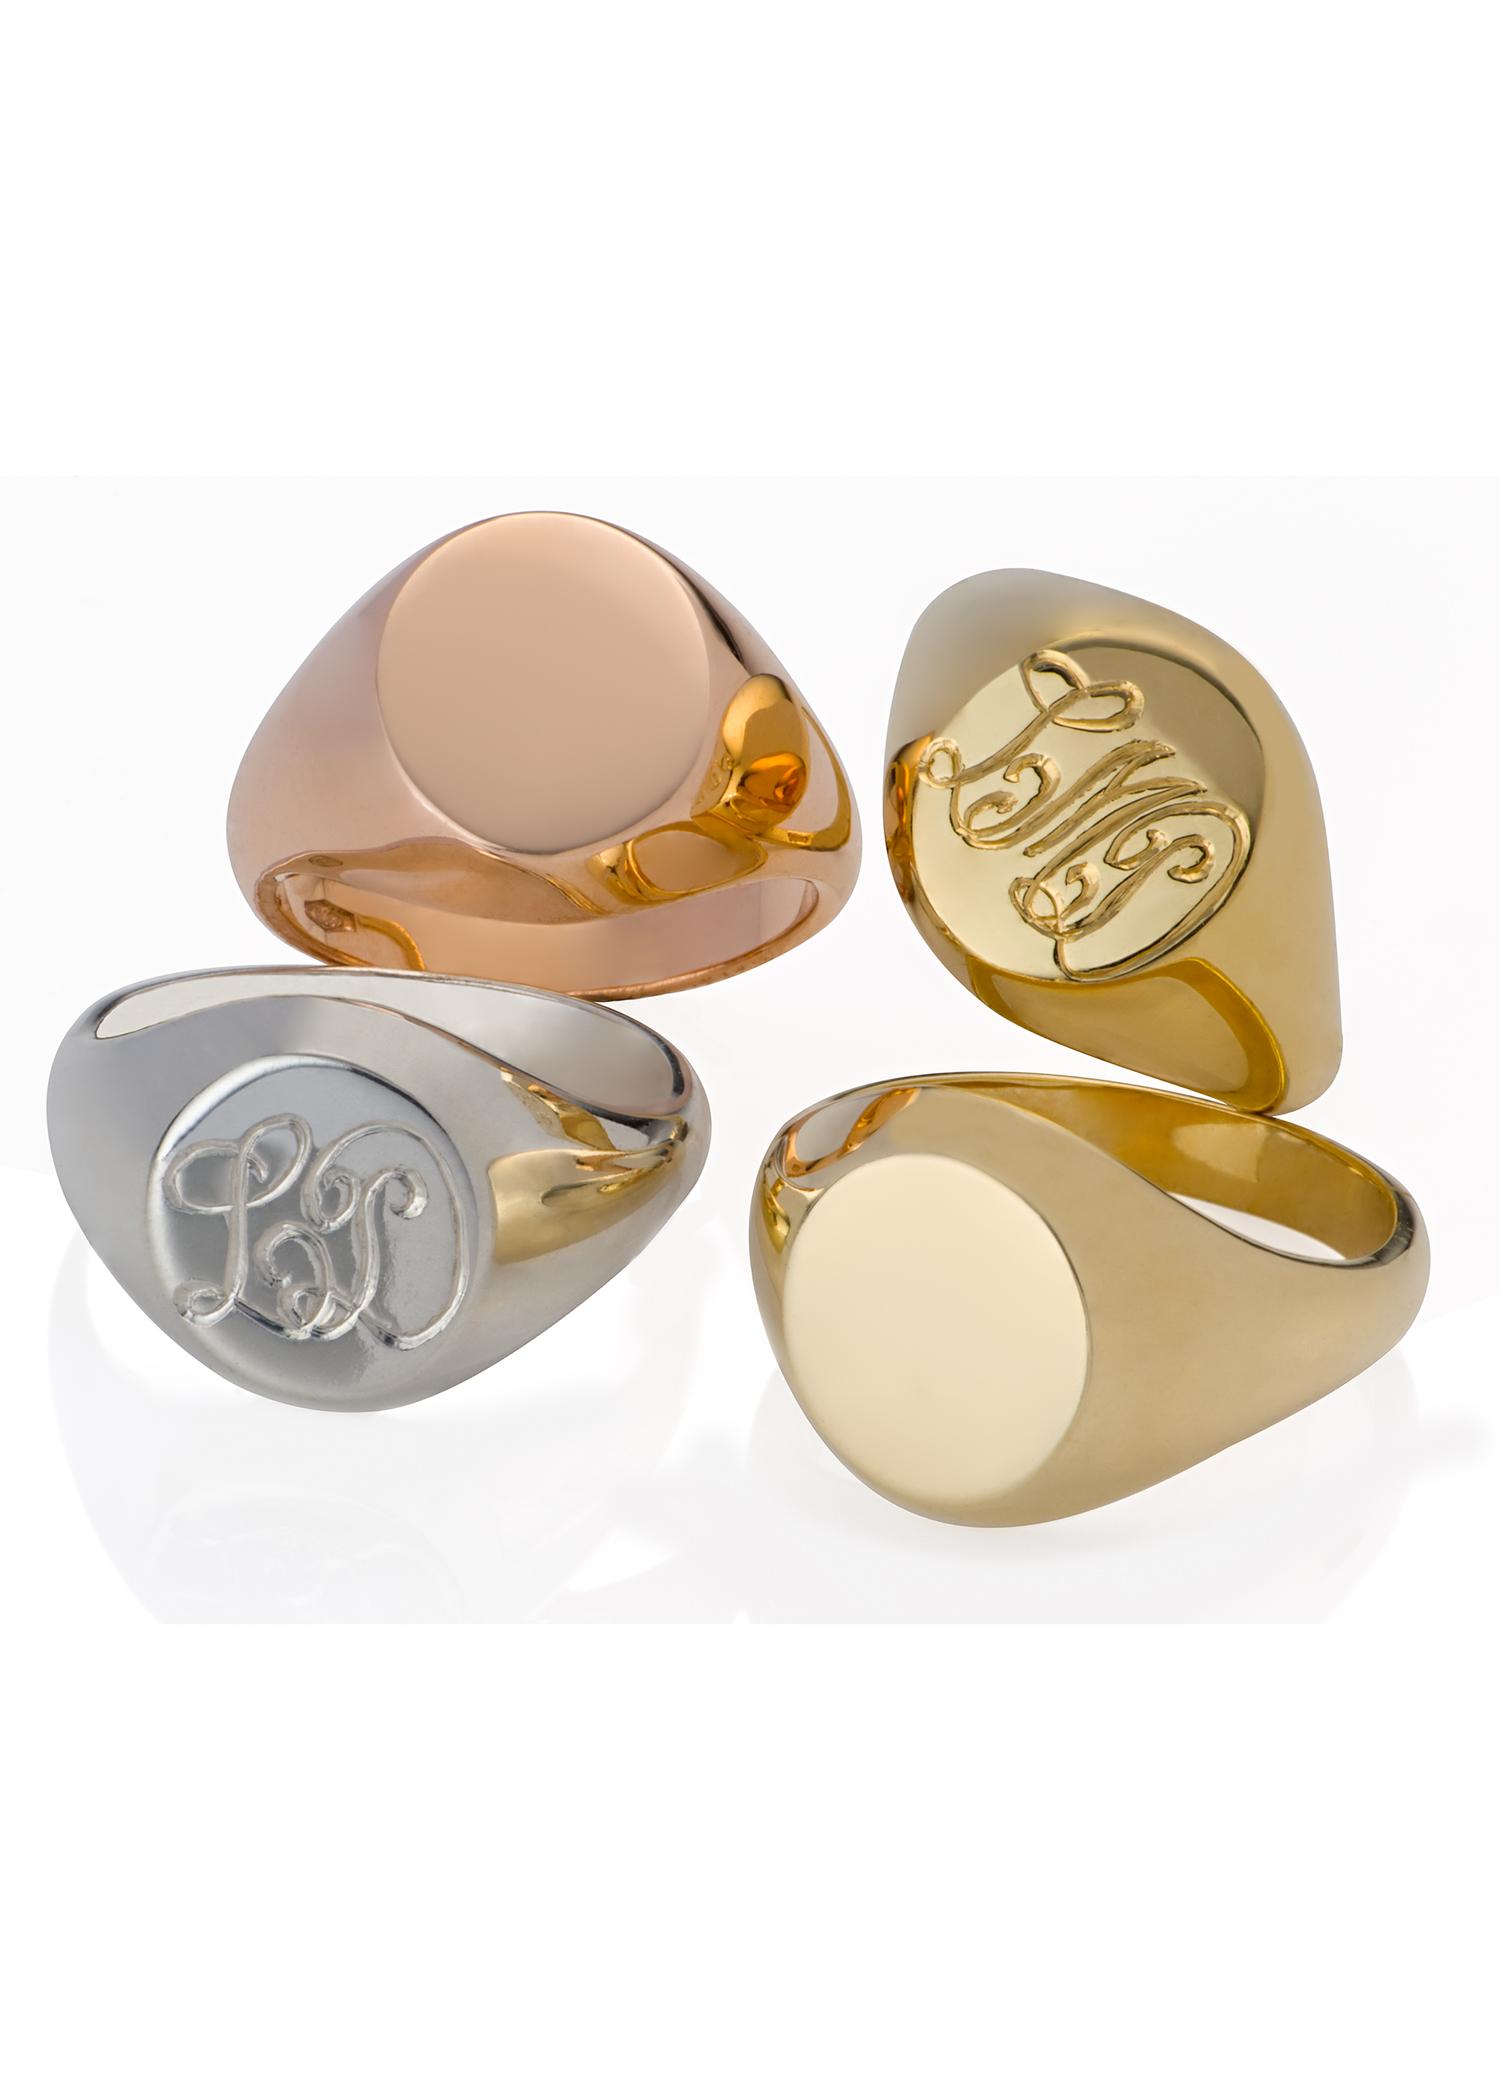 the lannah dunn monogram ring  u2013 lannah dunn